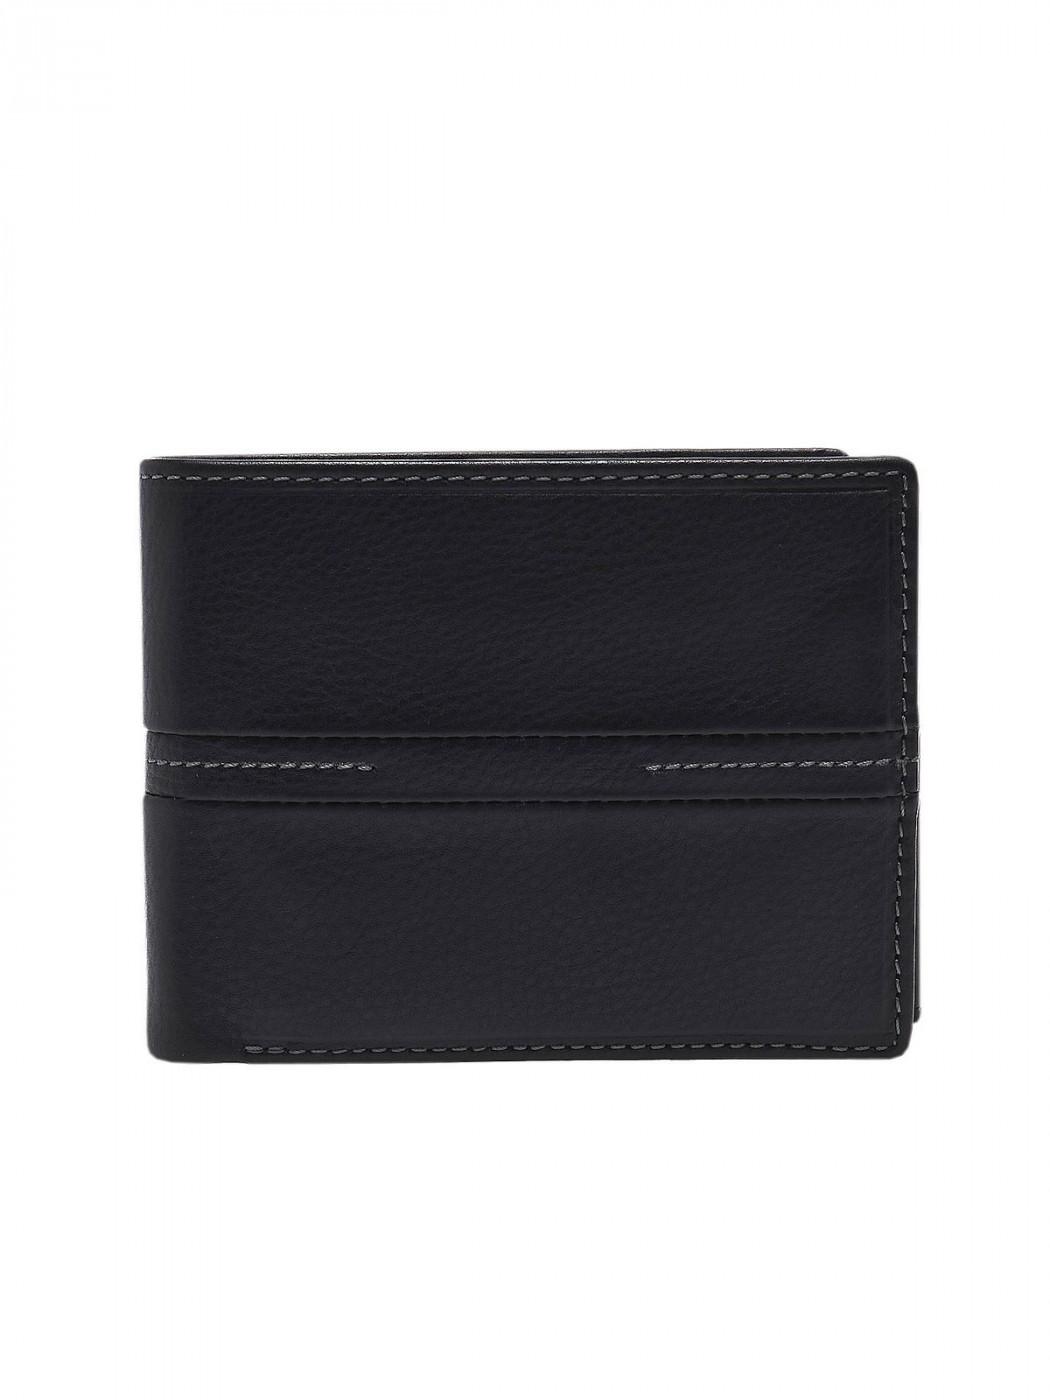 Men's wallet Top Secret Detailed